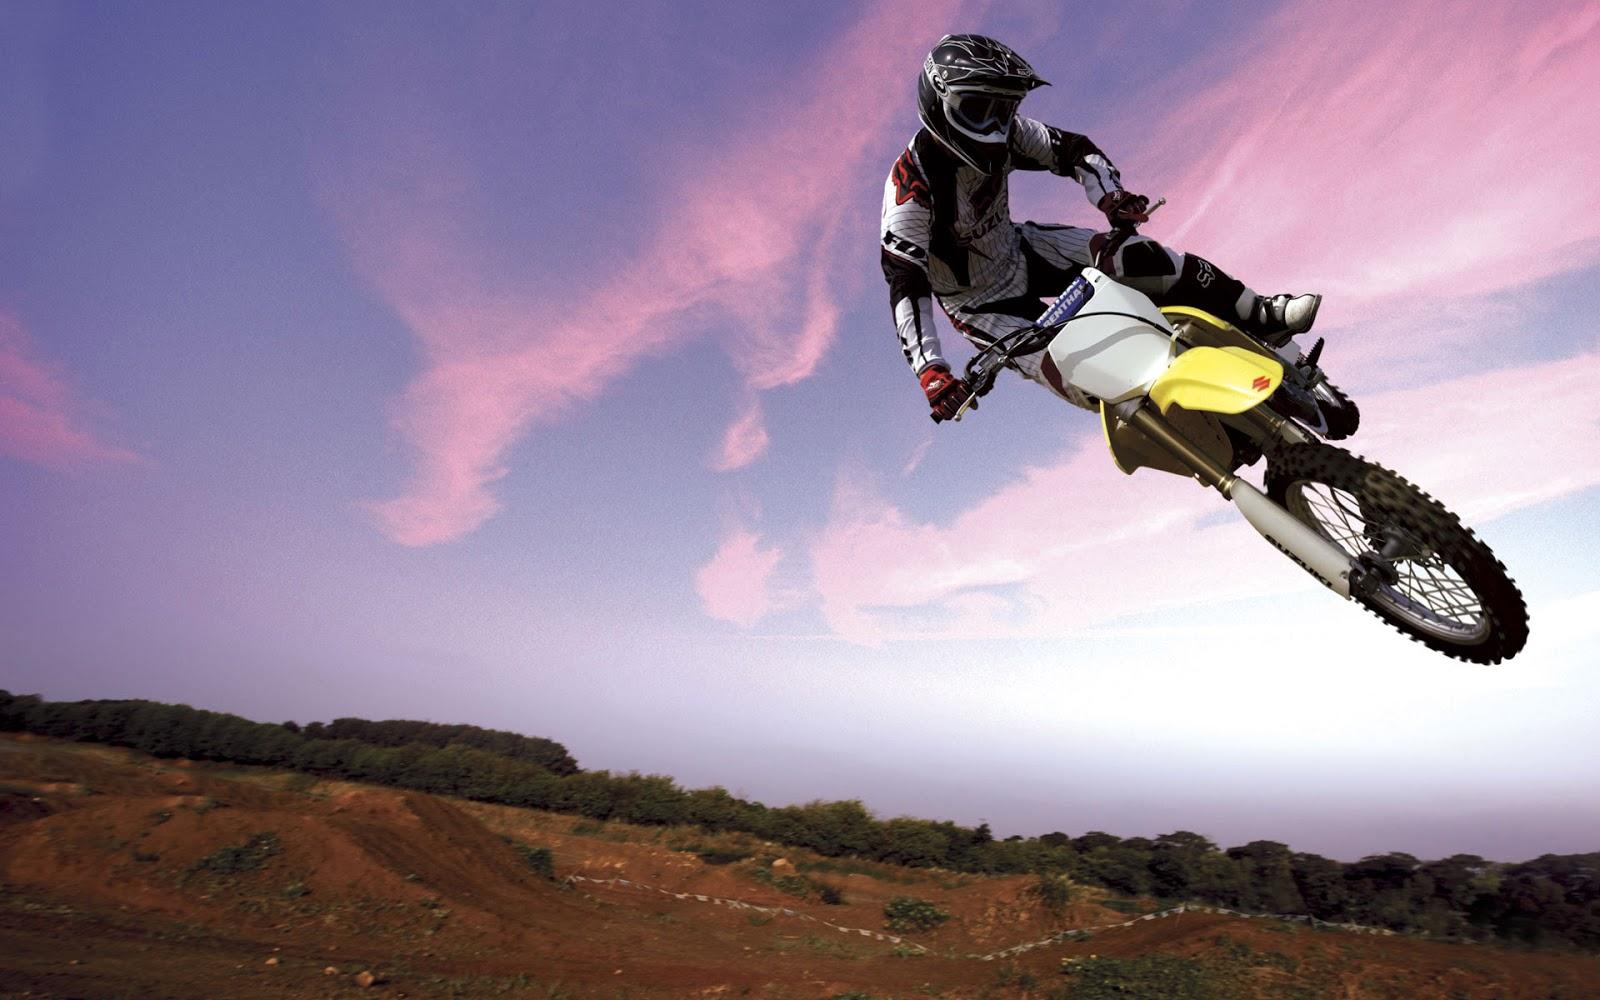 Wallpaper Dekstop Motocross HD Wallpaper 1600x1000